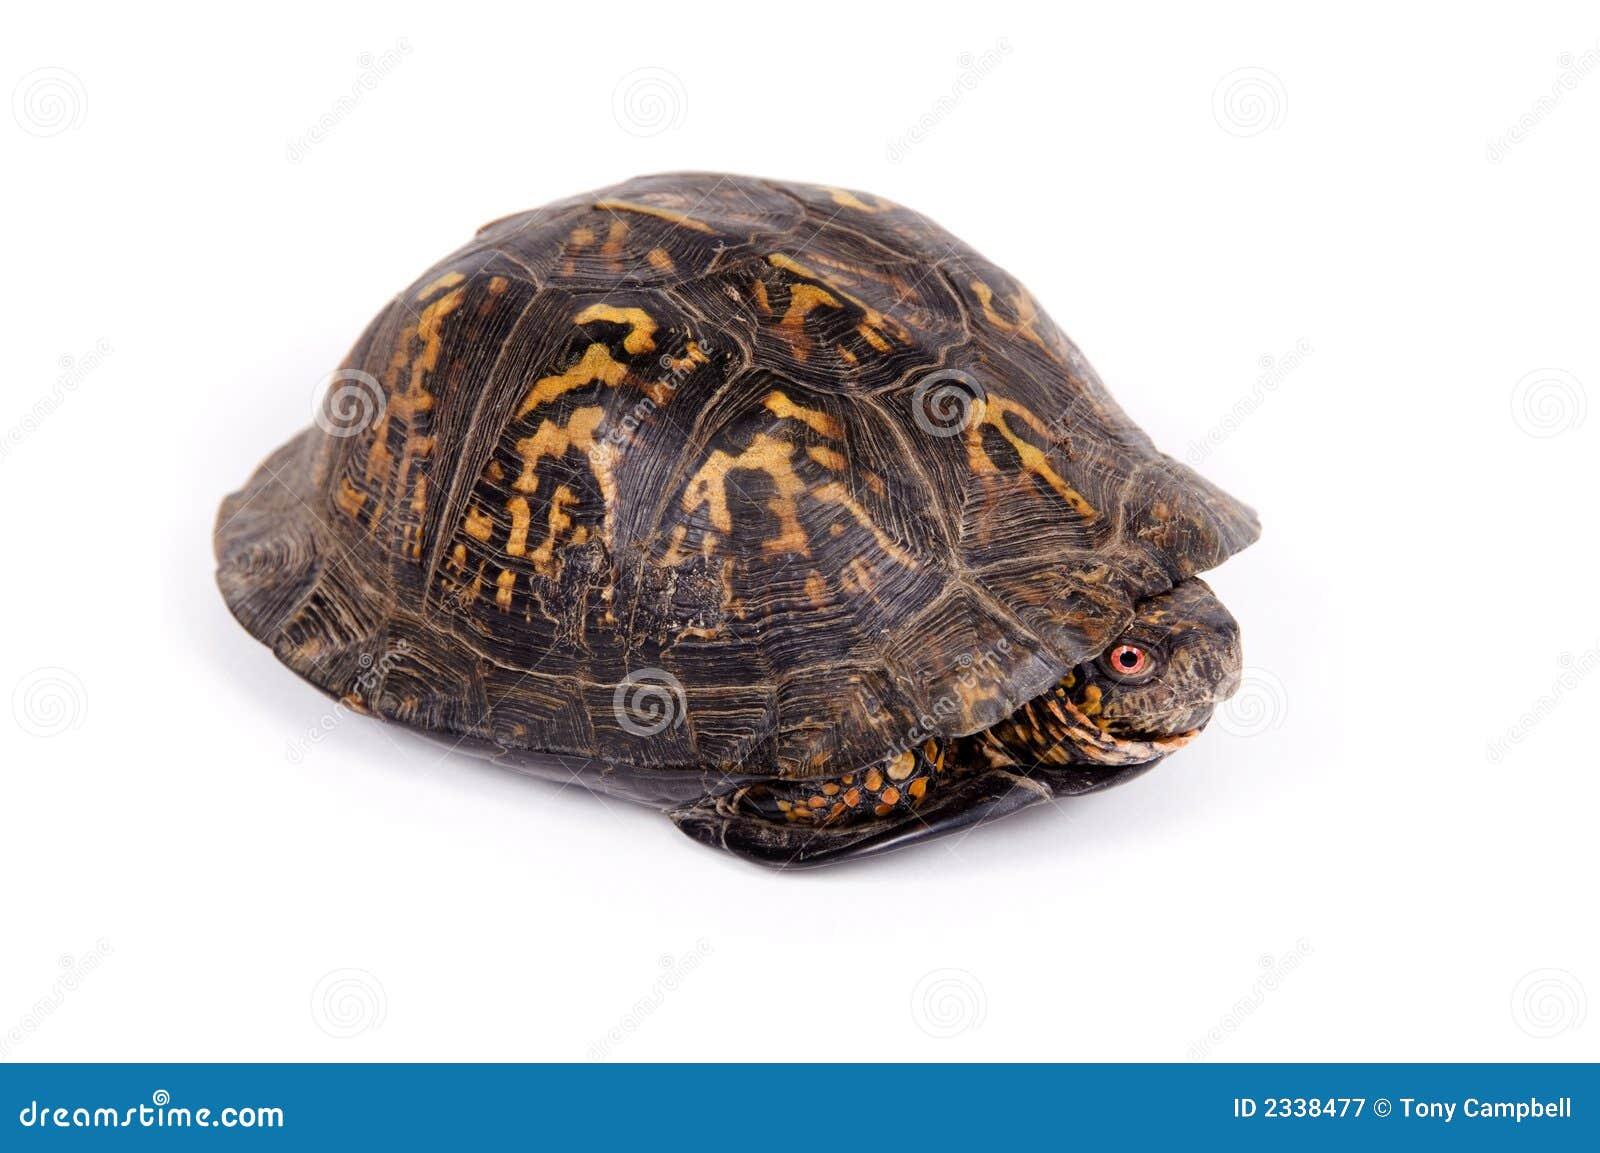 box turtle on white background royalty free stock